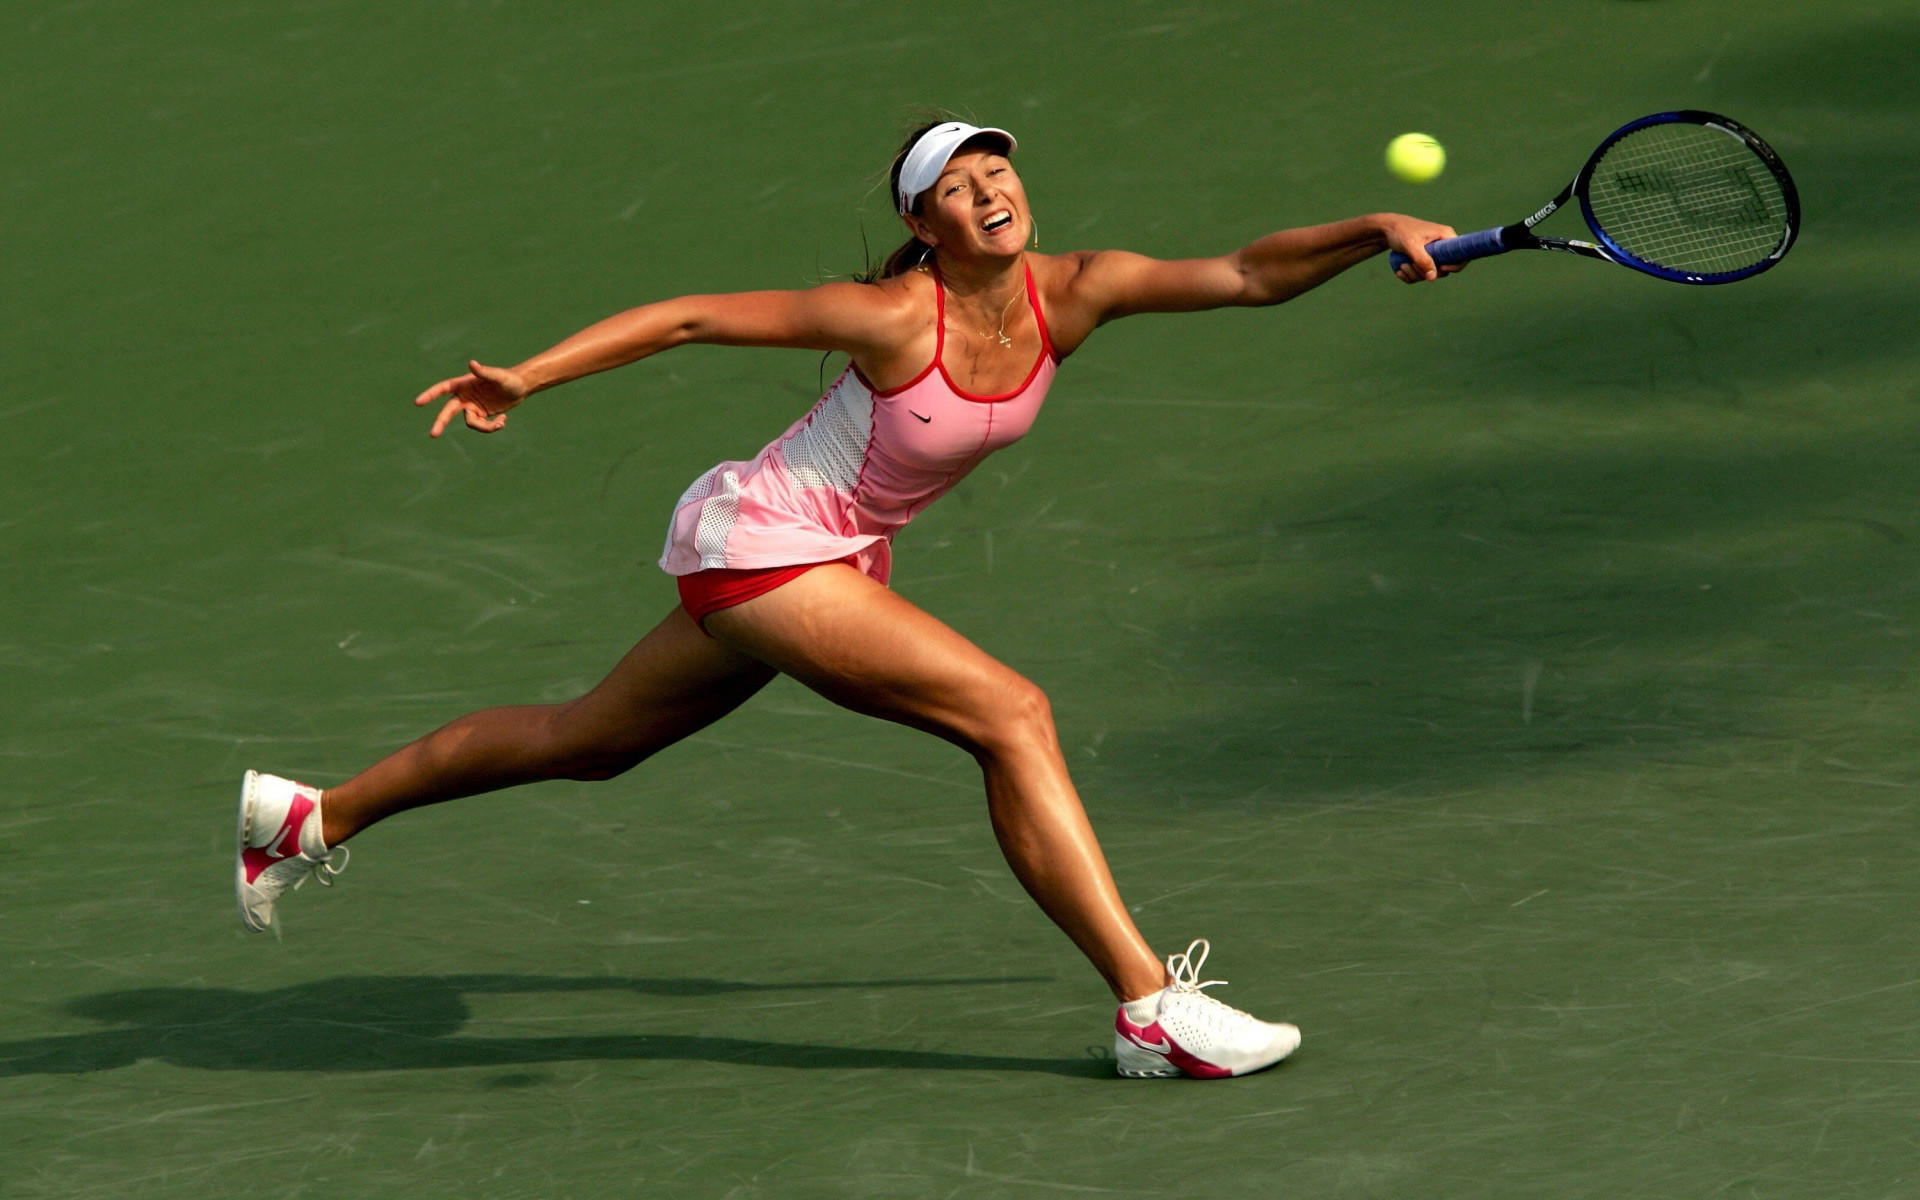 Теннис - Центр спортивной подготовки Республики Татарстан